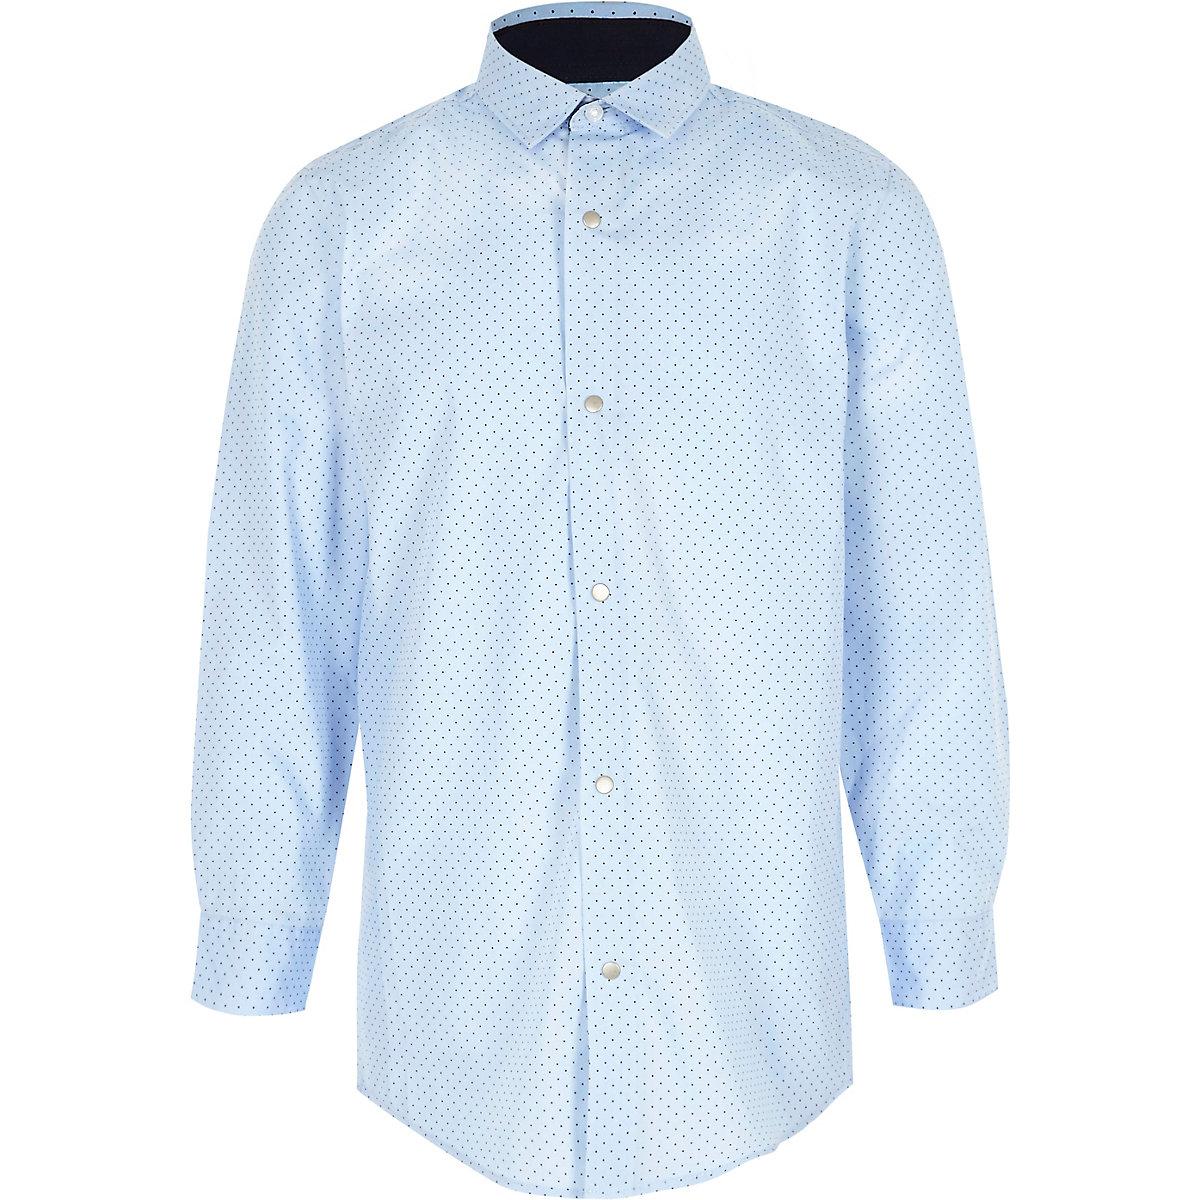 Hellblaues, gepunktetes Hemd